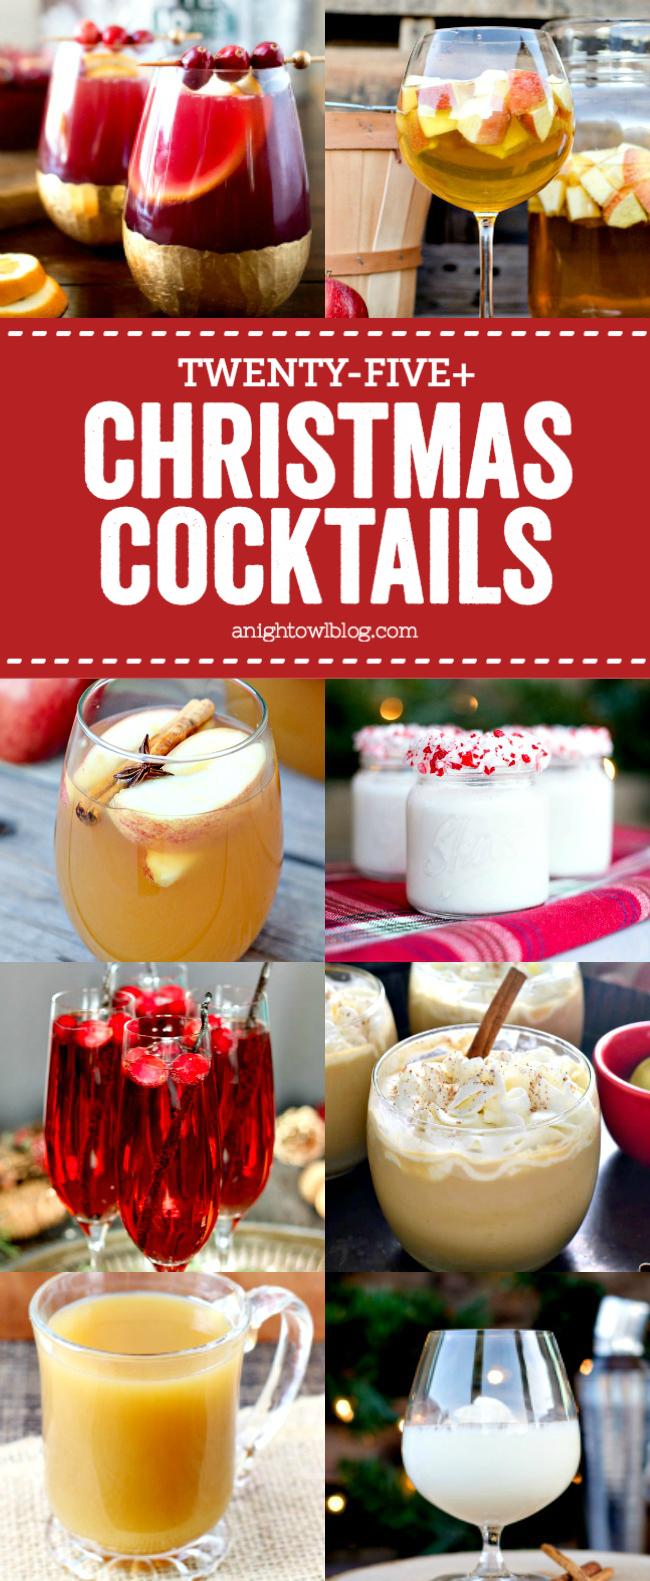 25 Christmas Cocktail Recipes A Night Owl Blog